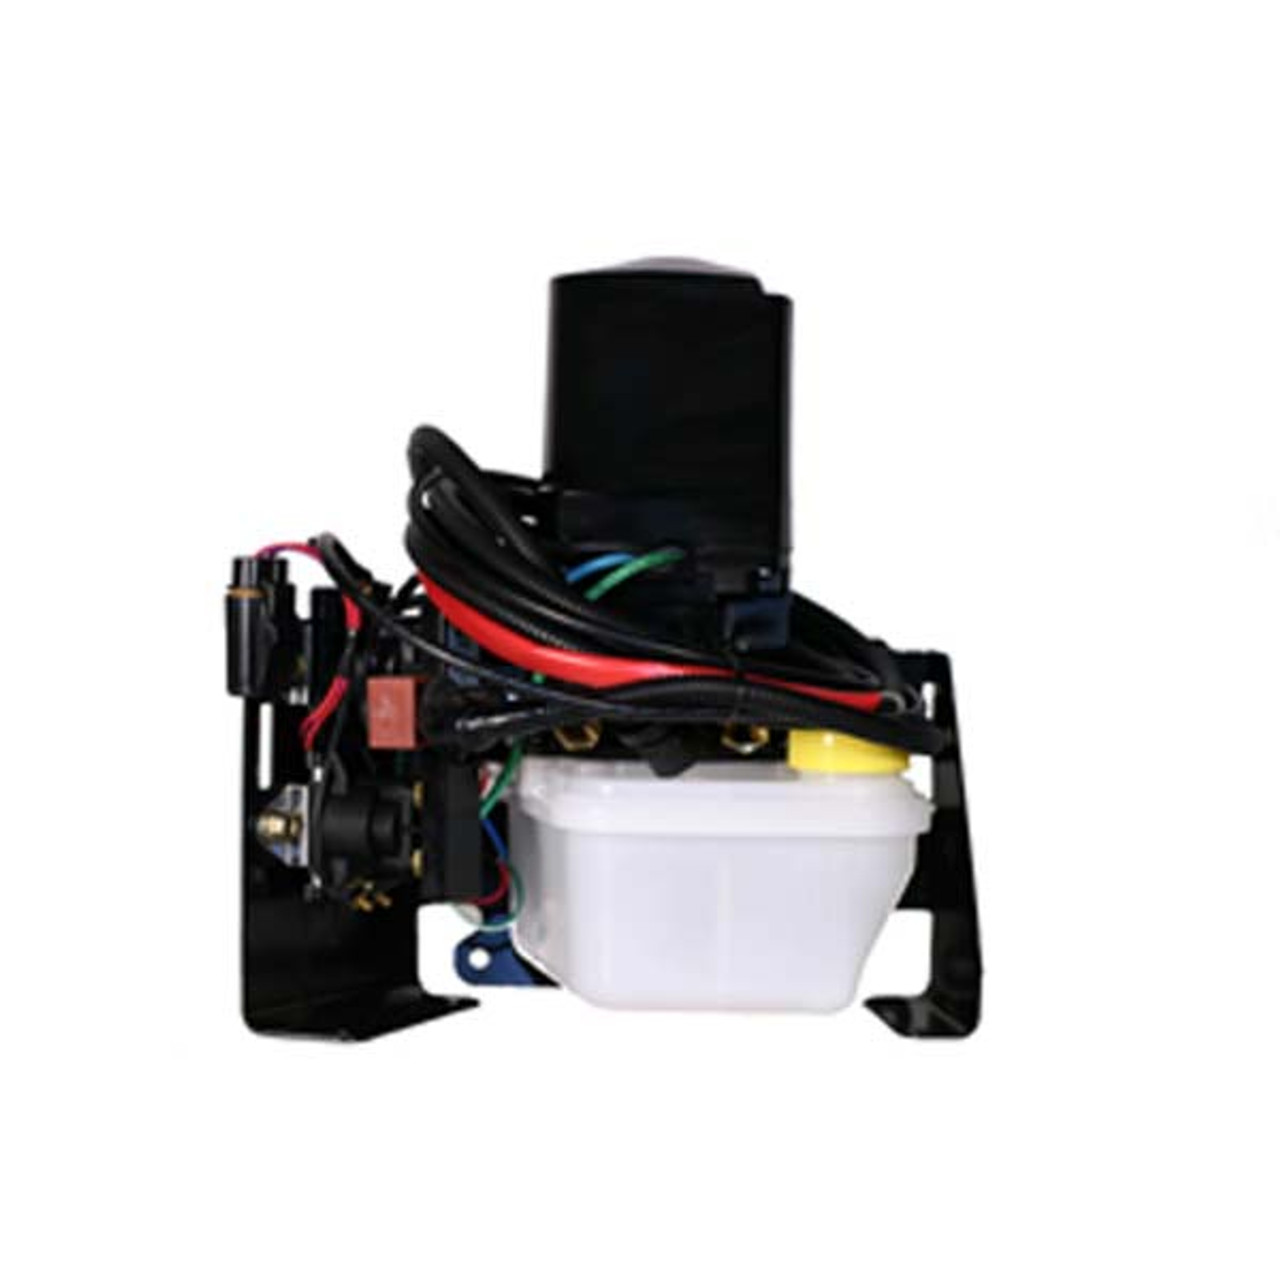 SEI Mercruiser Alpha One Trim Pump Assembly